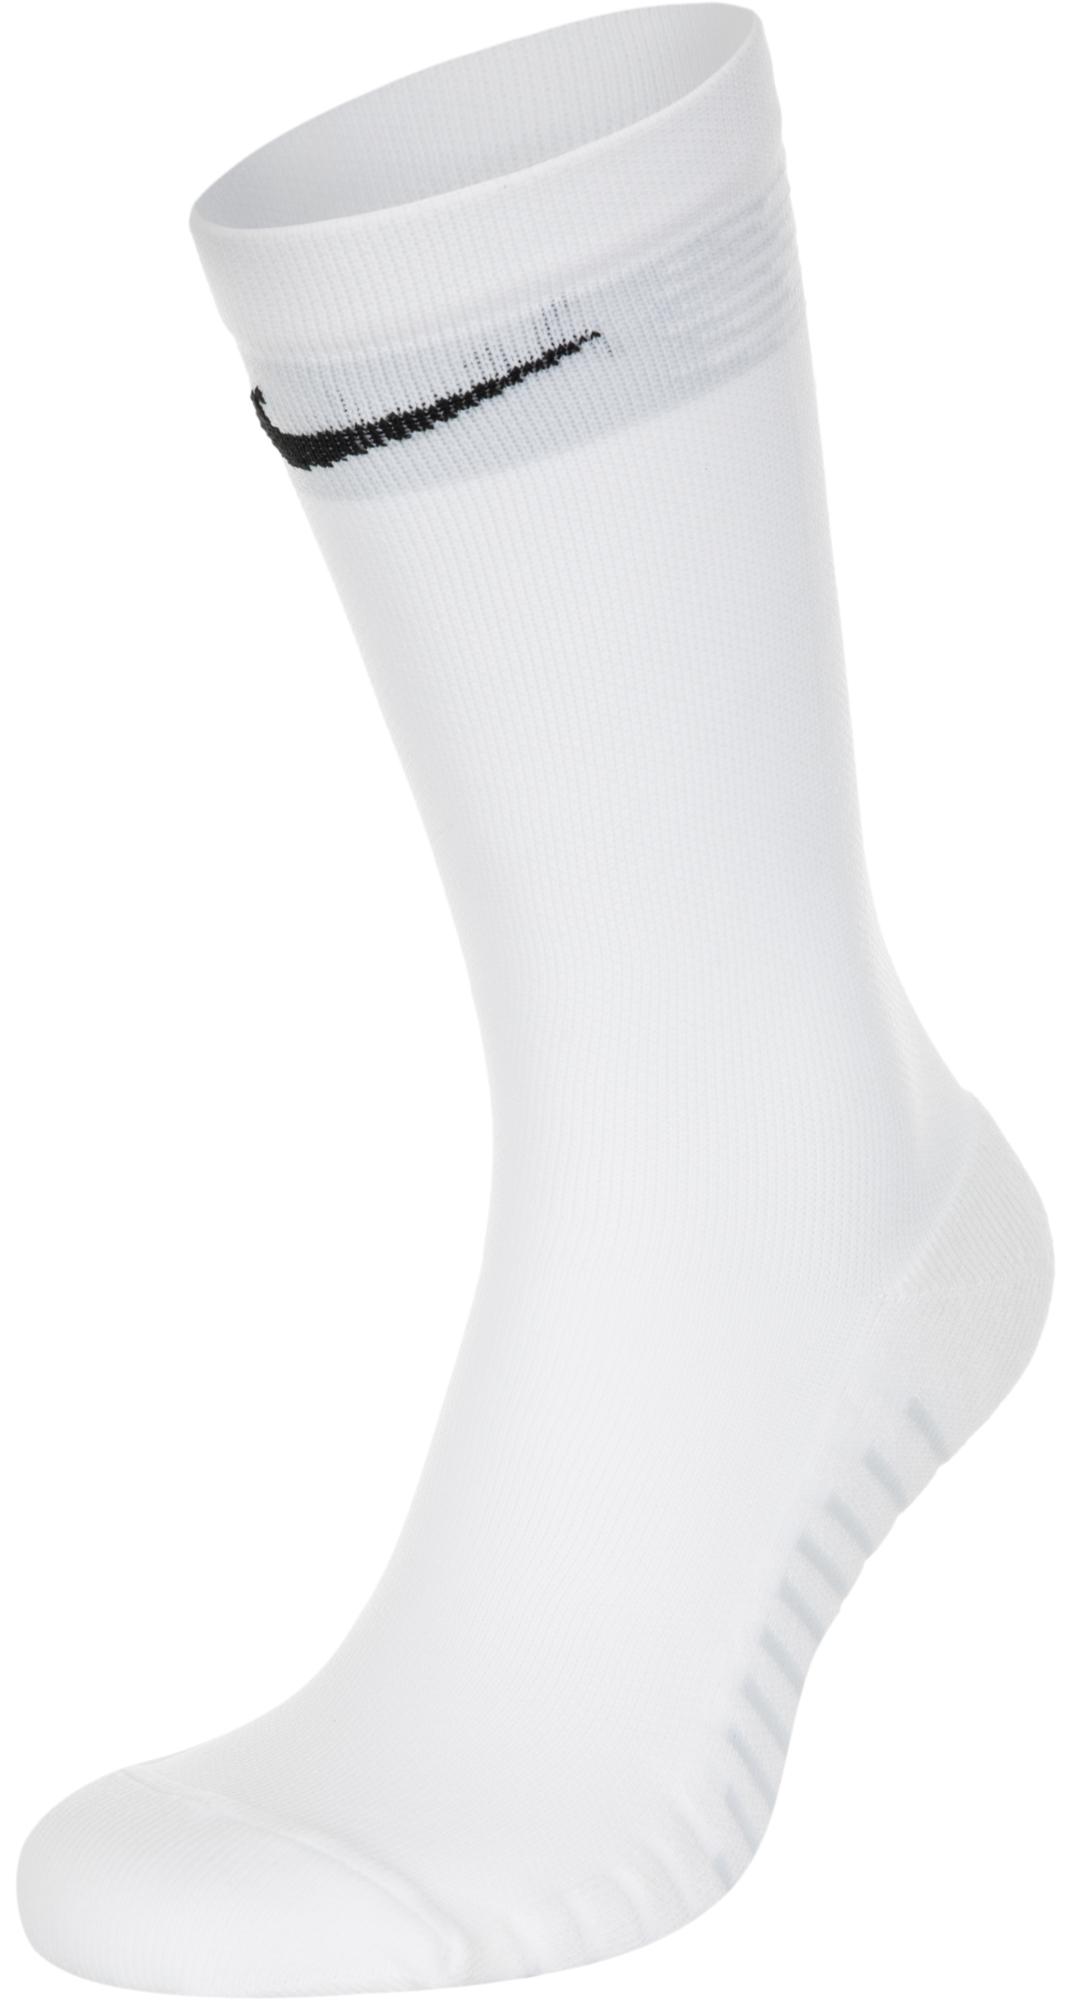 Nike Гетры мужские Squad, размер 41-45